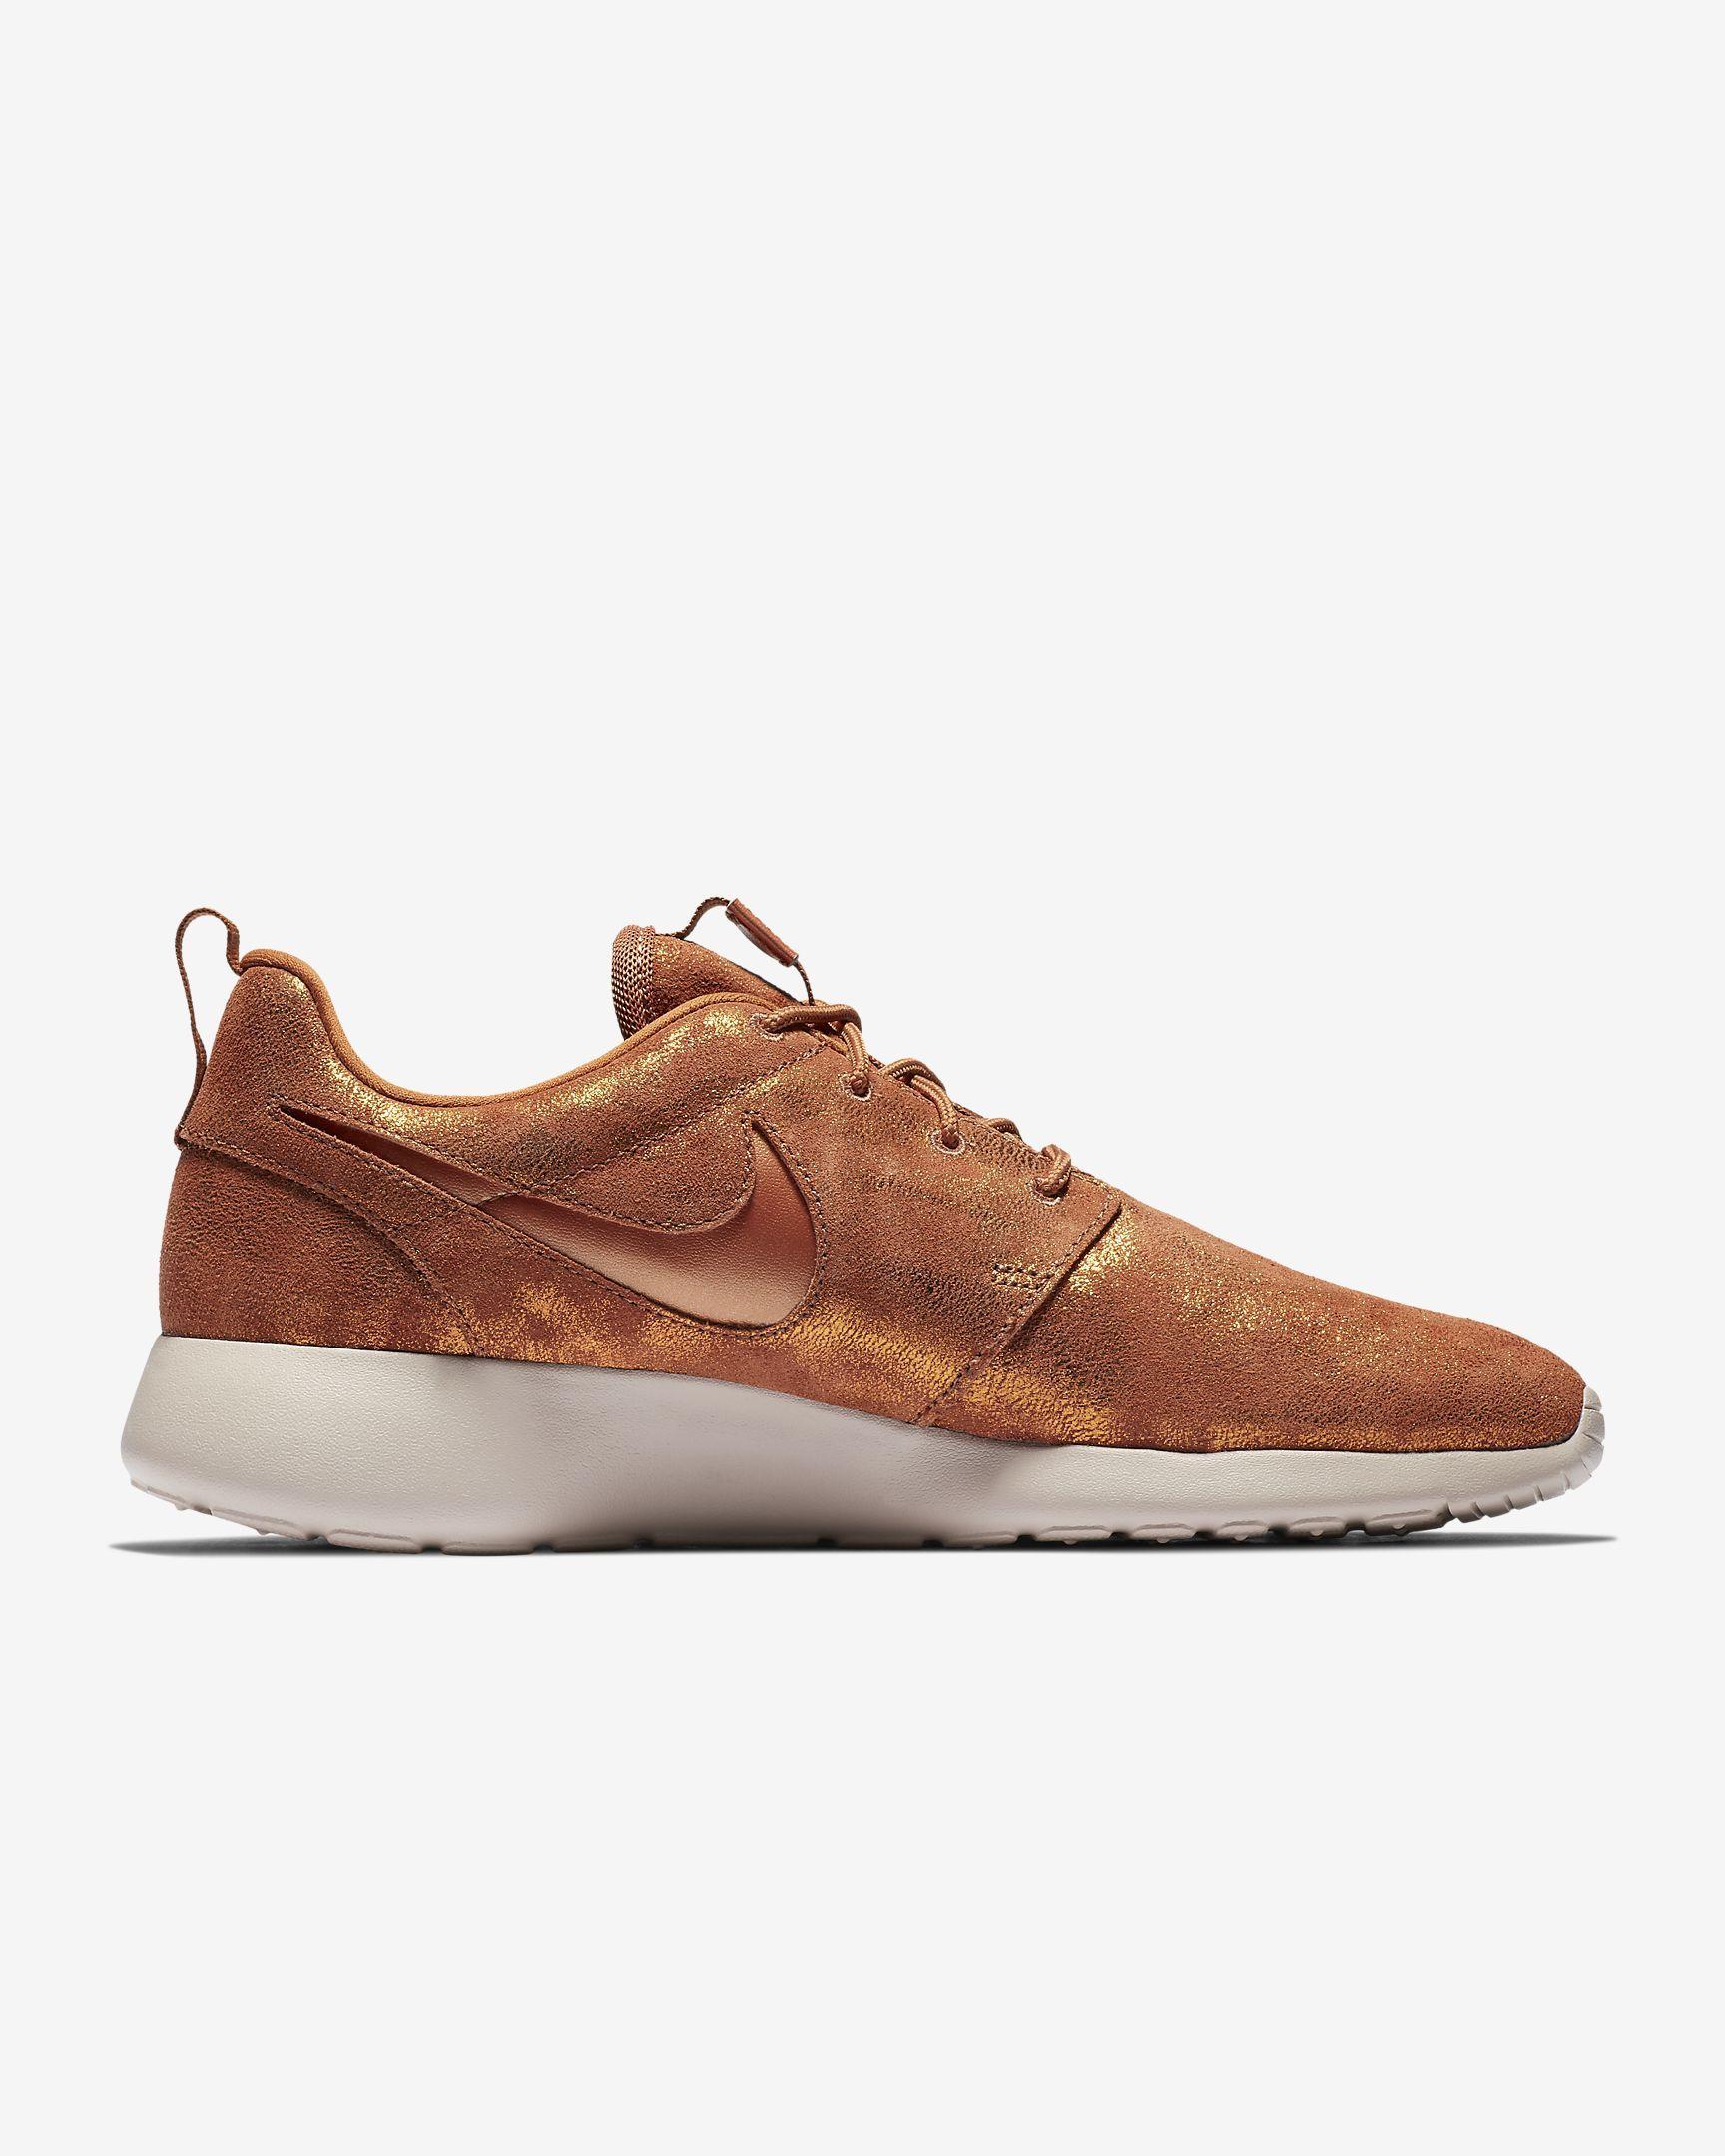 hot sale online 79995 bc277 Nike Roshe One Premium Women s Shoe